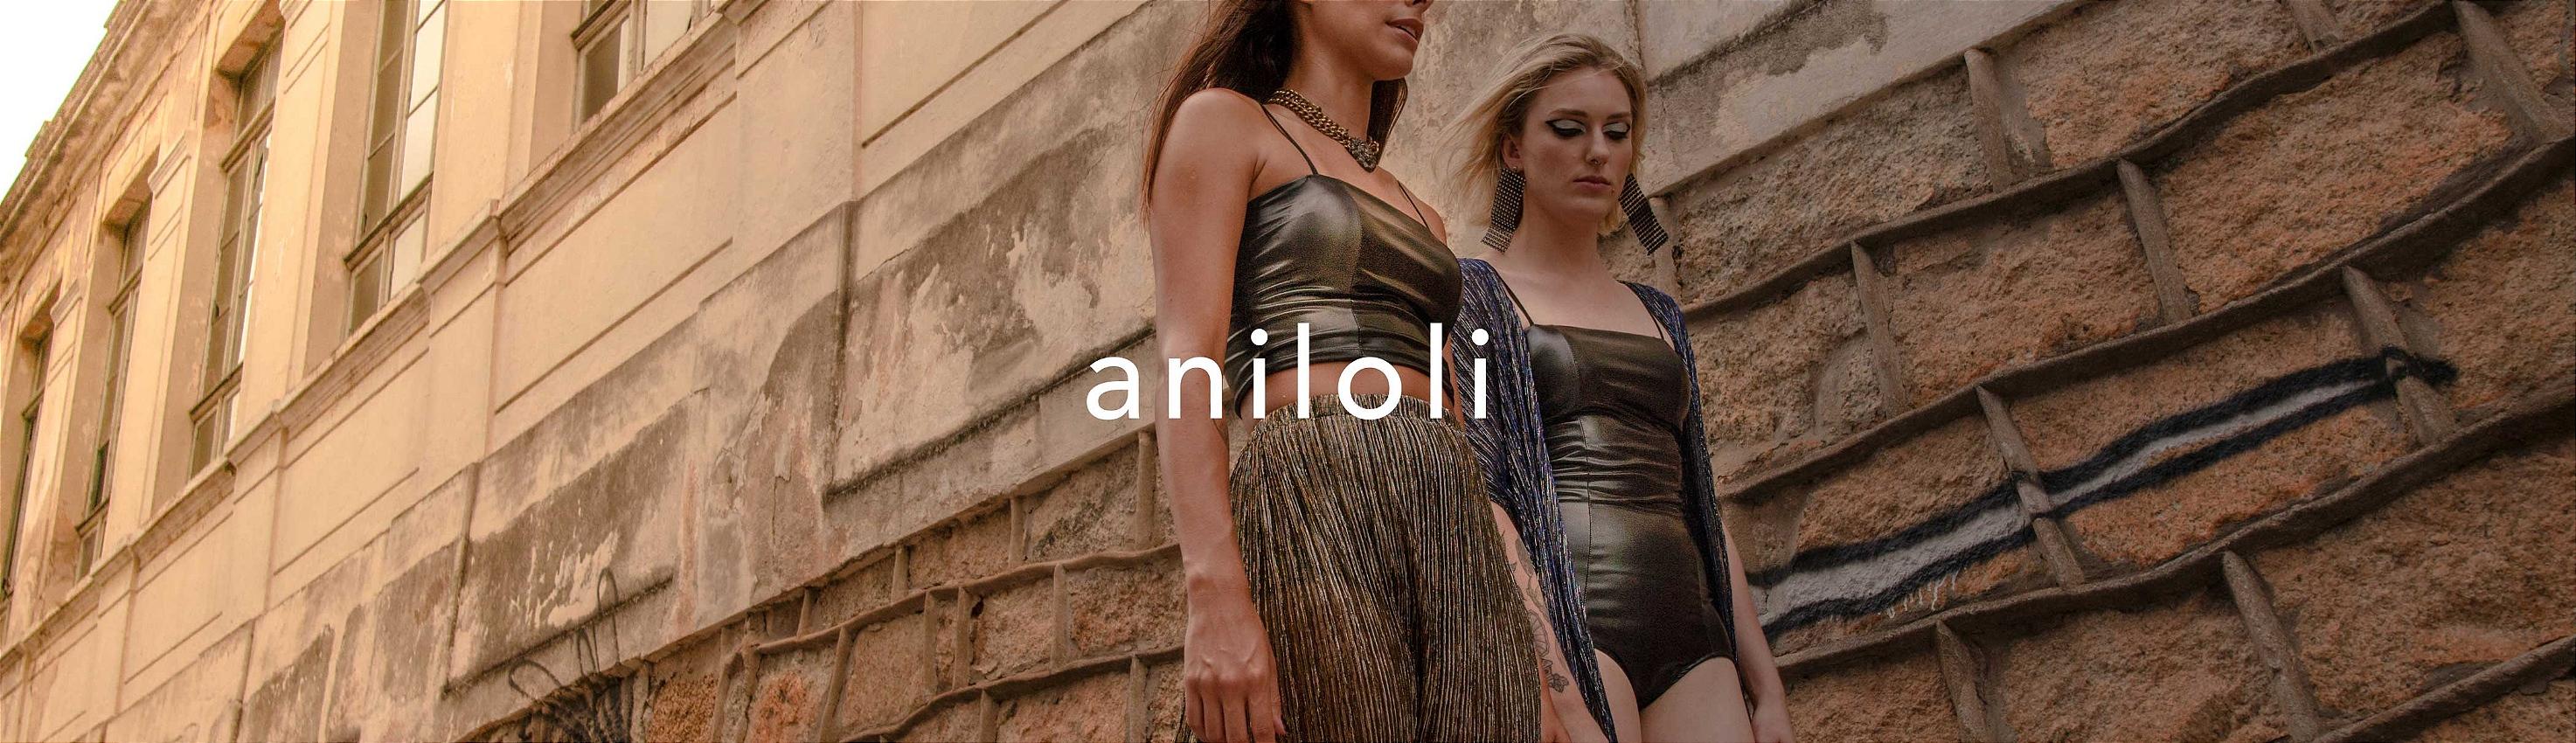 Aniloli